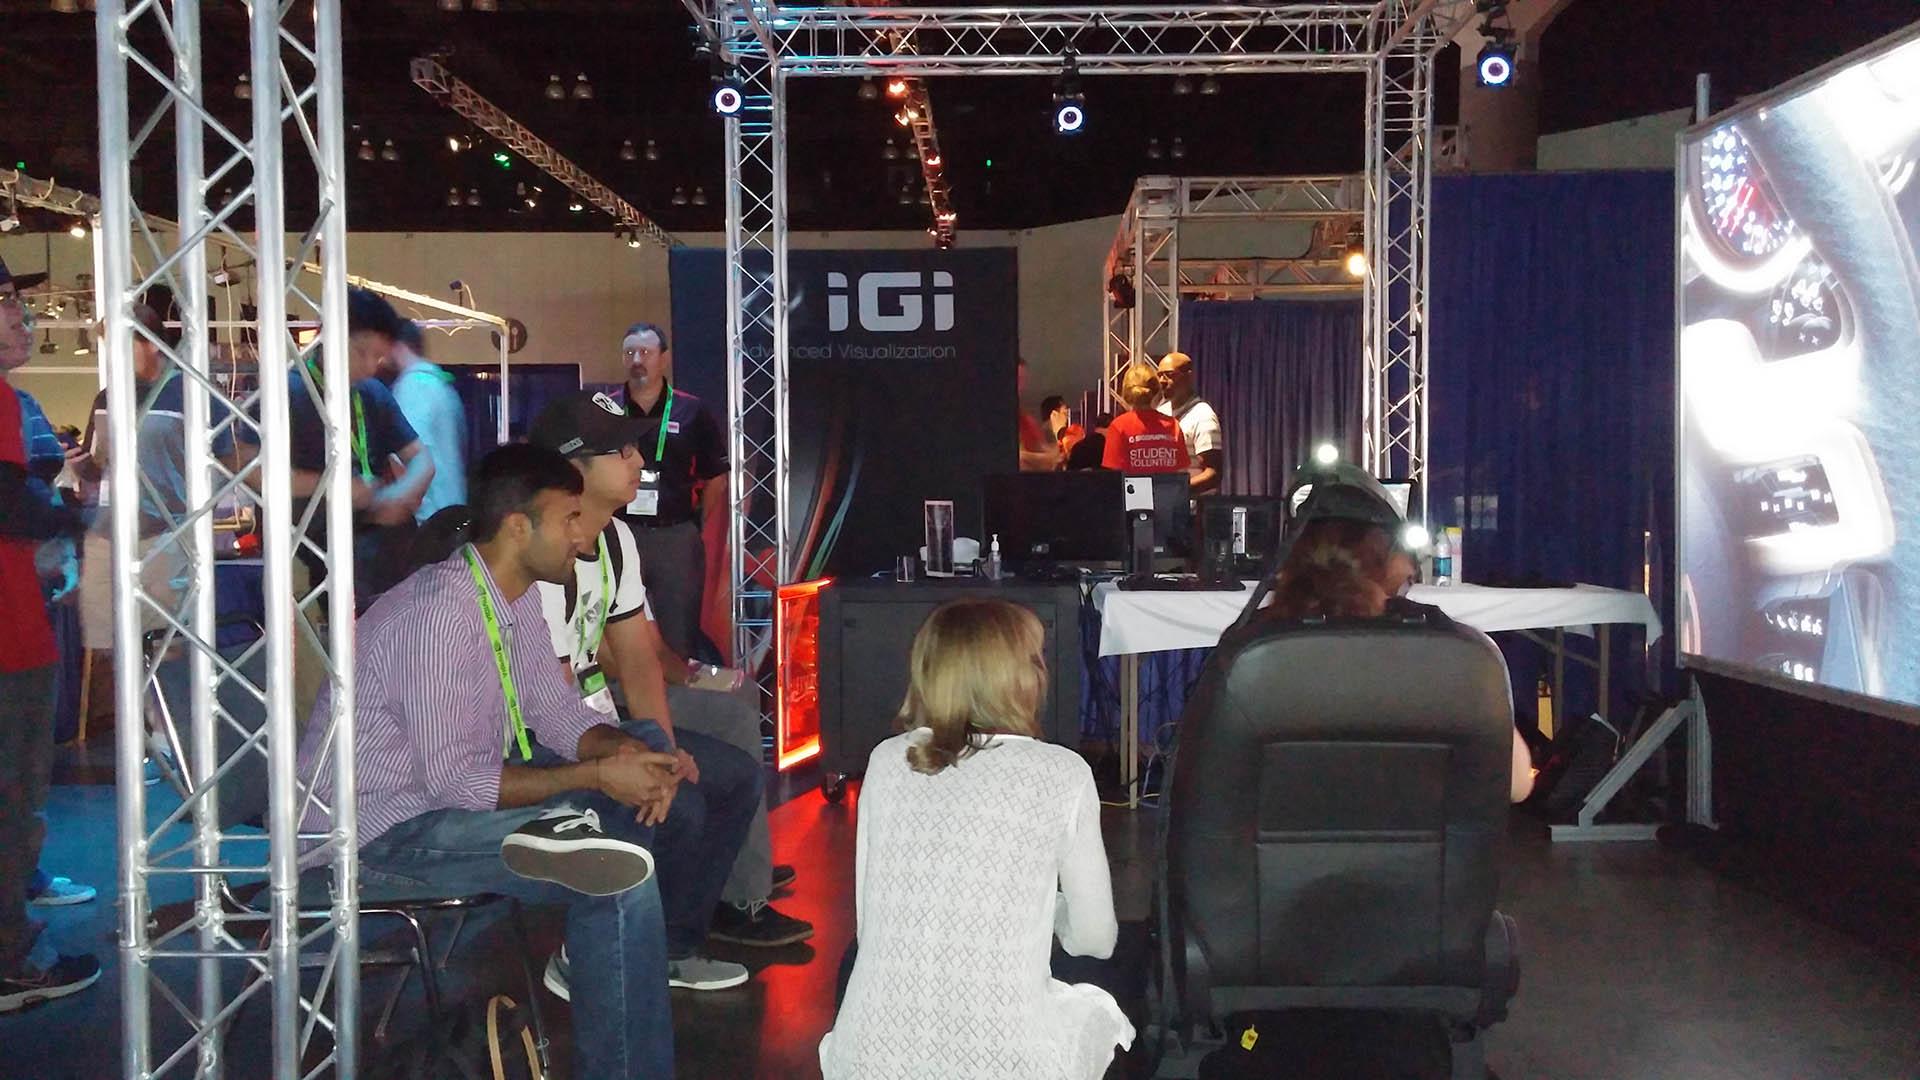 SIGGRAPH emerging technologies 4K laser powerwall VR